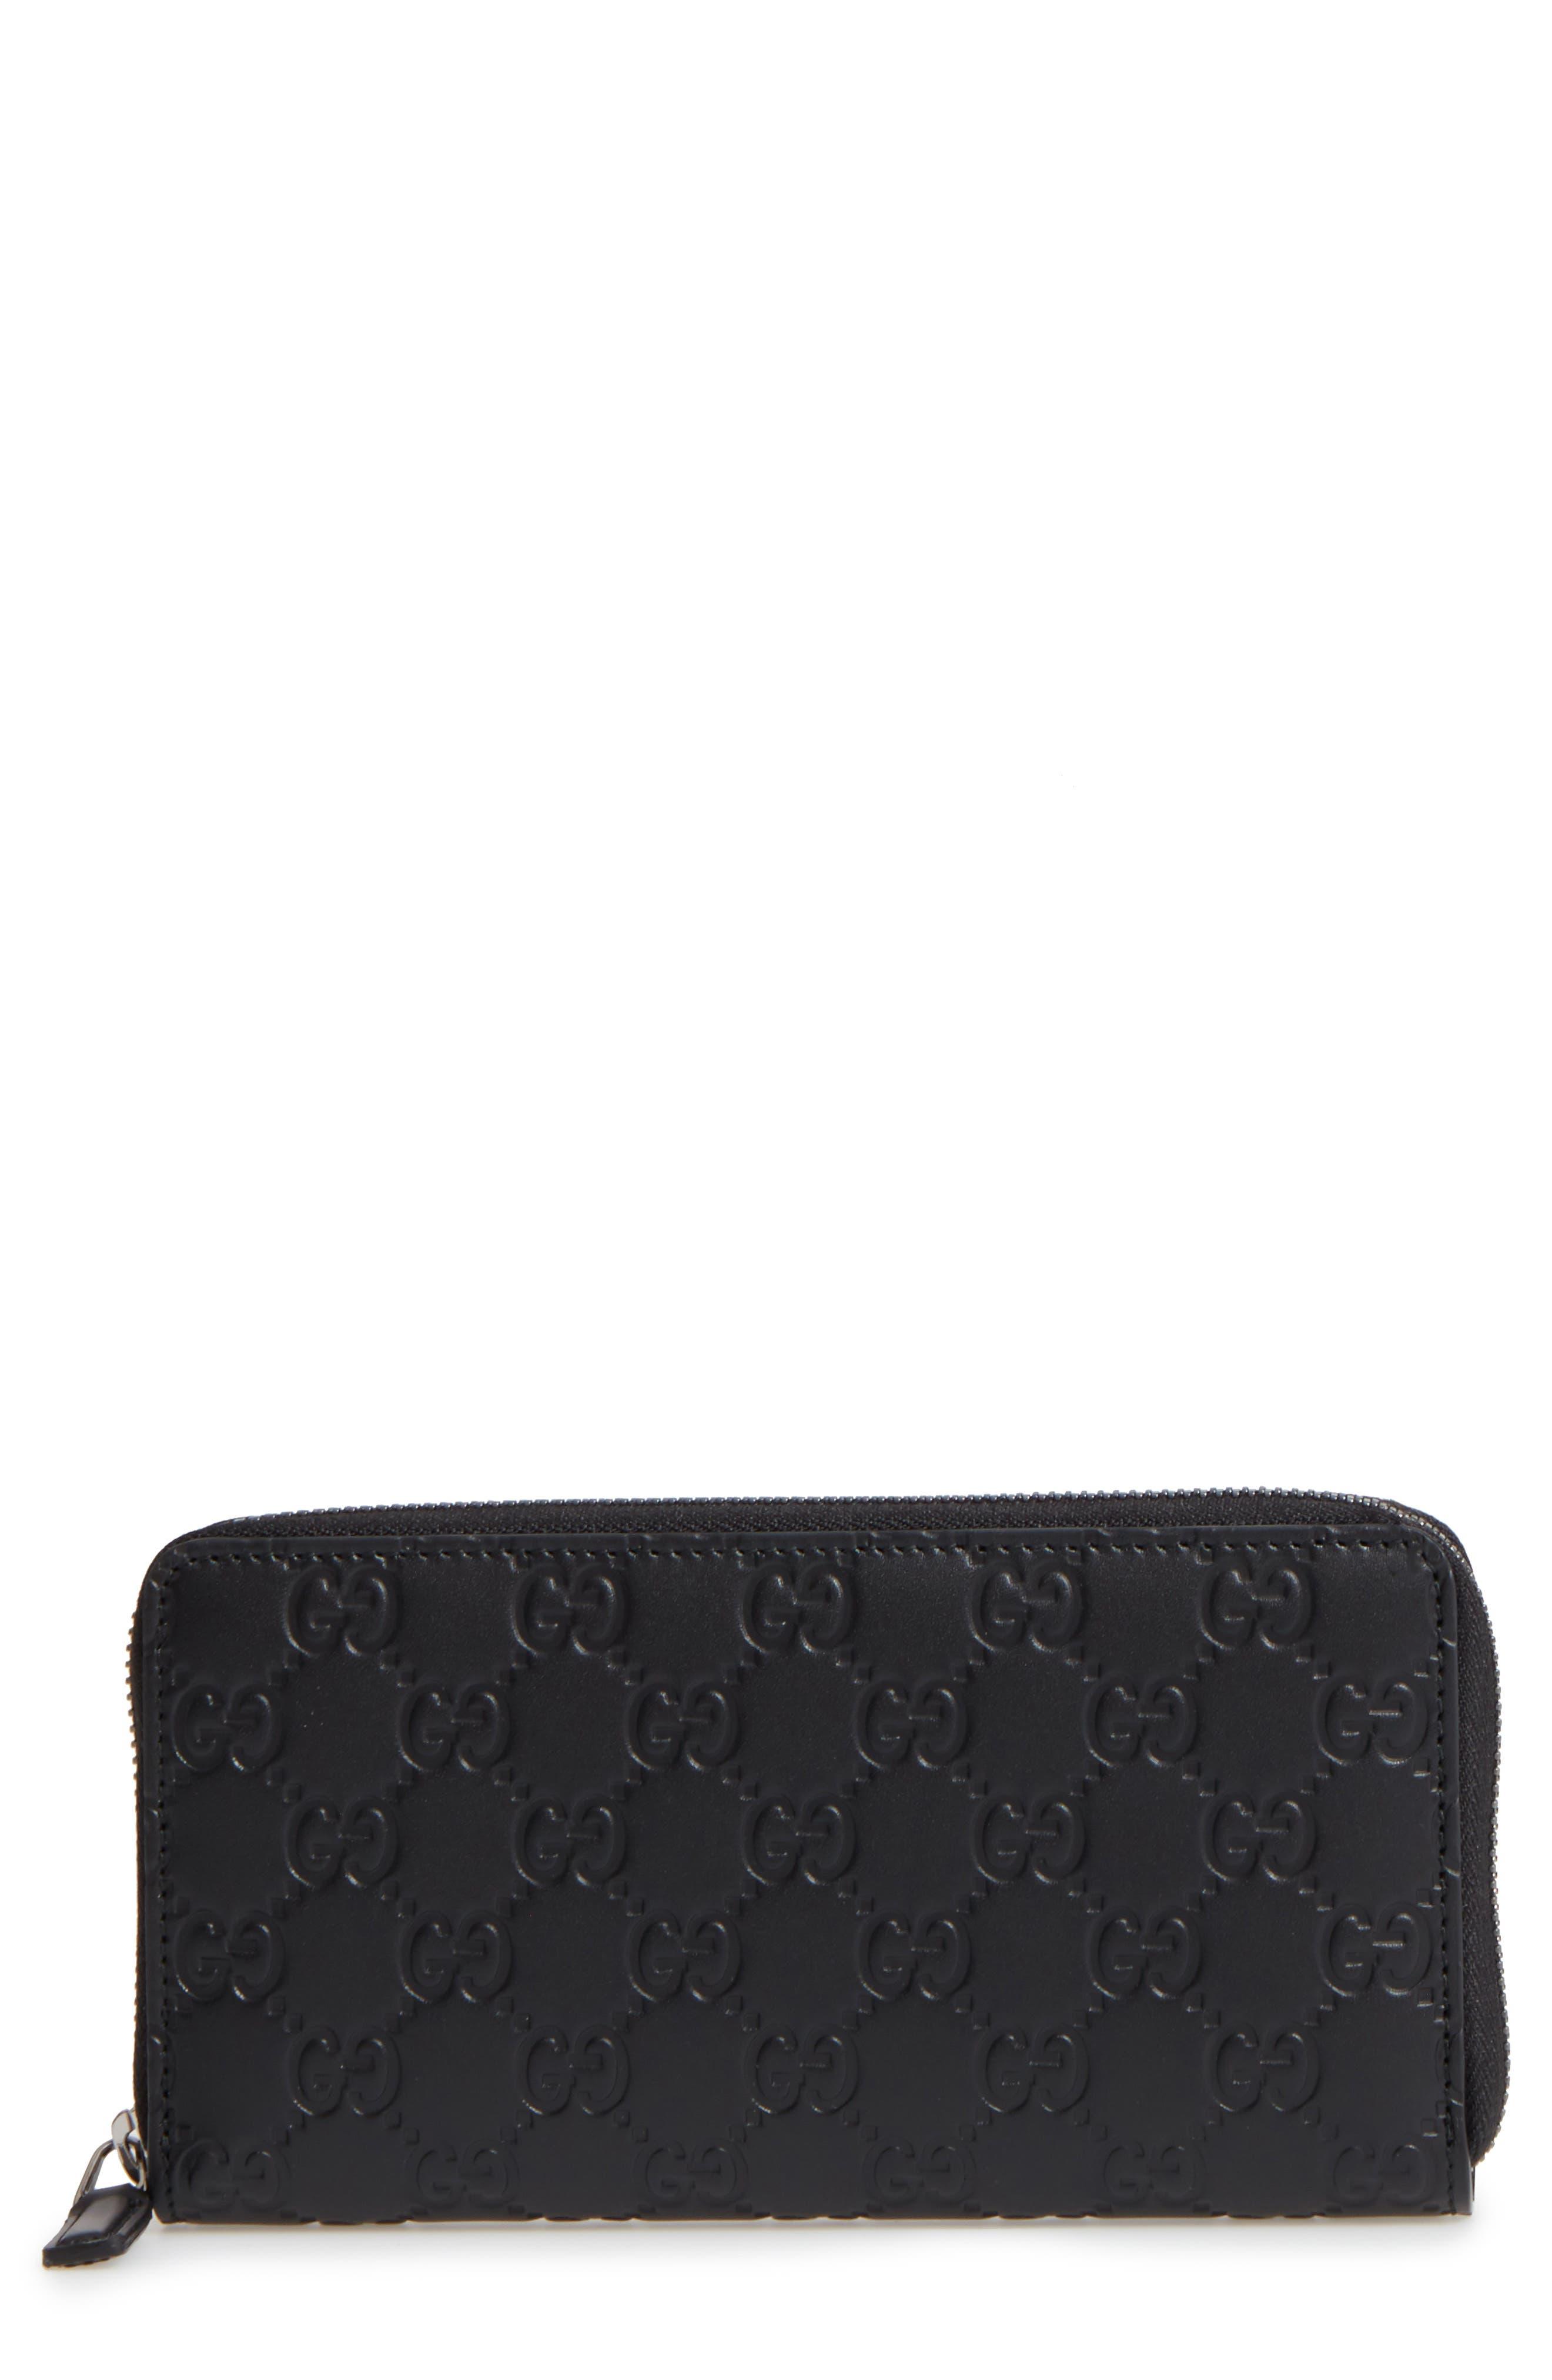 Alternate Image 1 Selected - Gucci Avel Zip Wallet